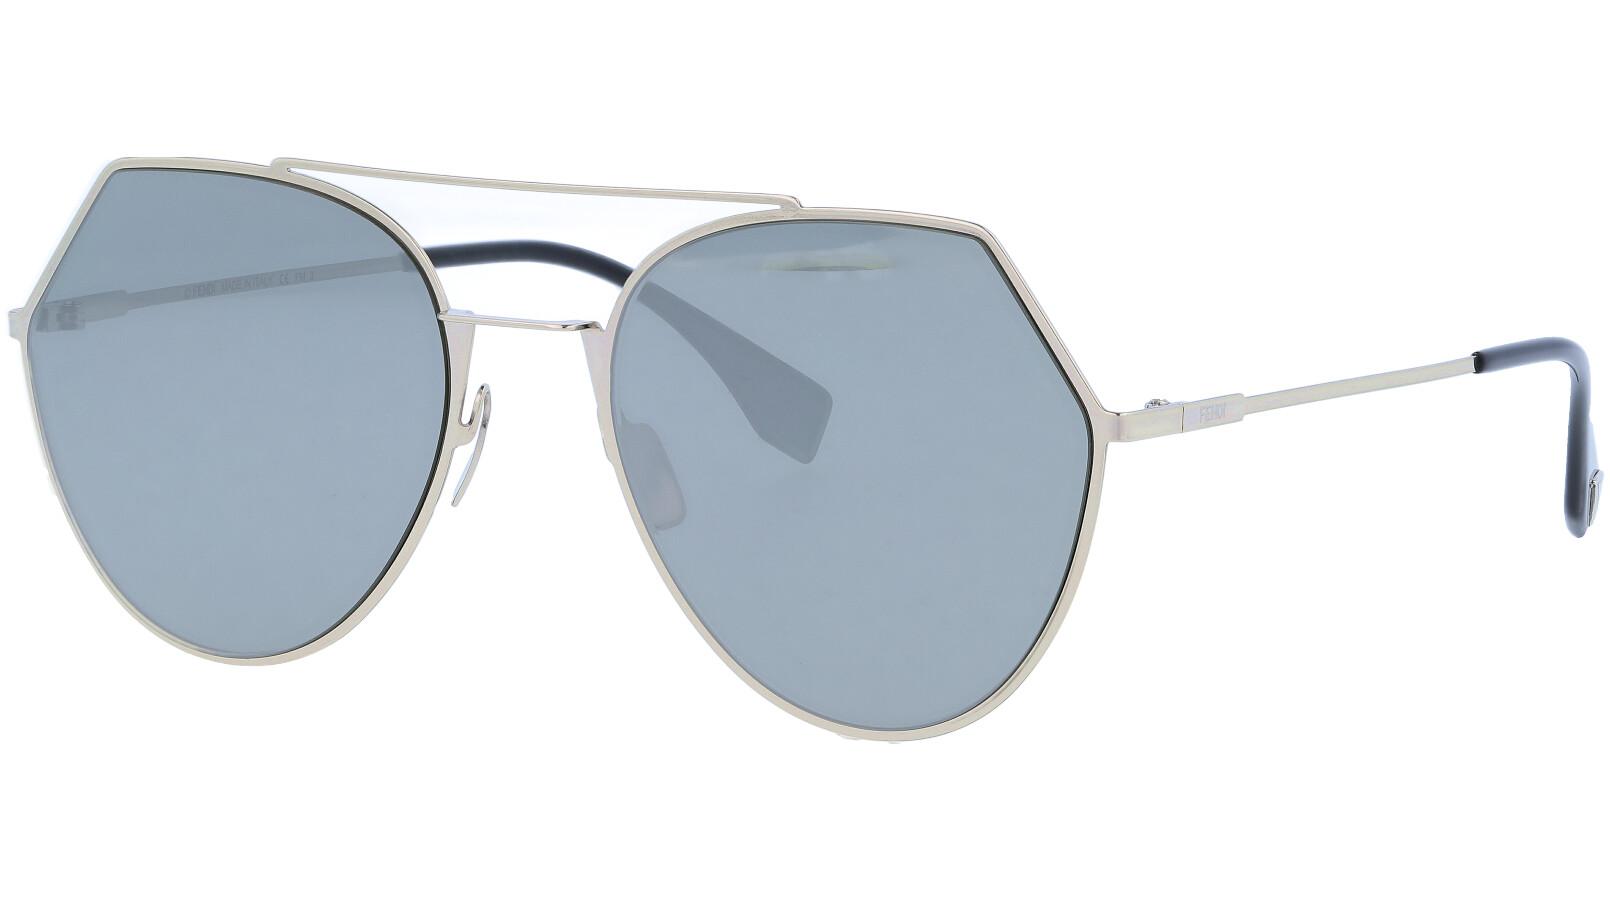 FENDI FF0194/S 3YG0T 55 Light Gold Sunglasses